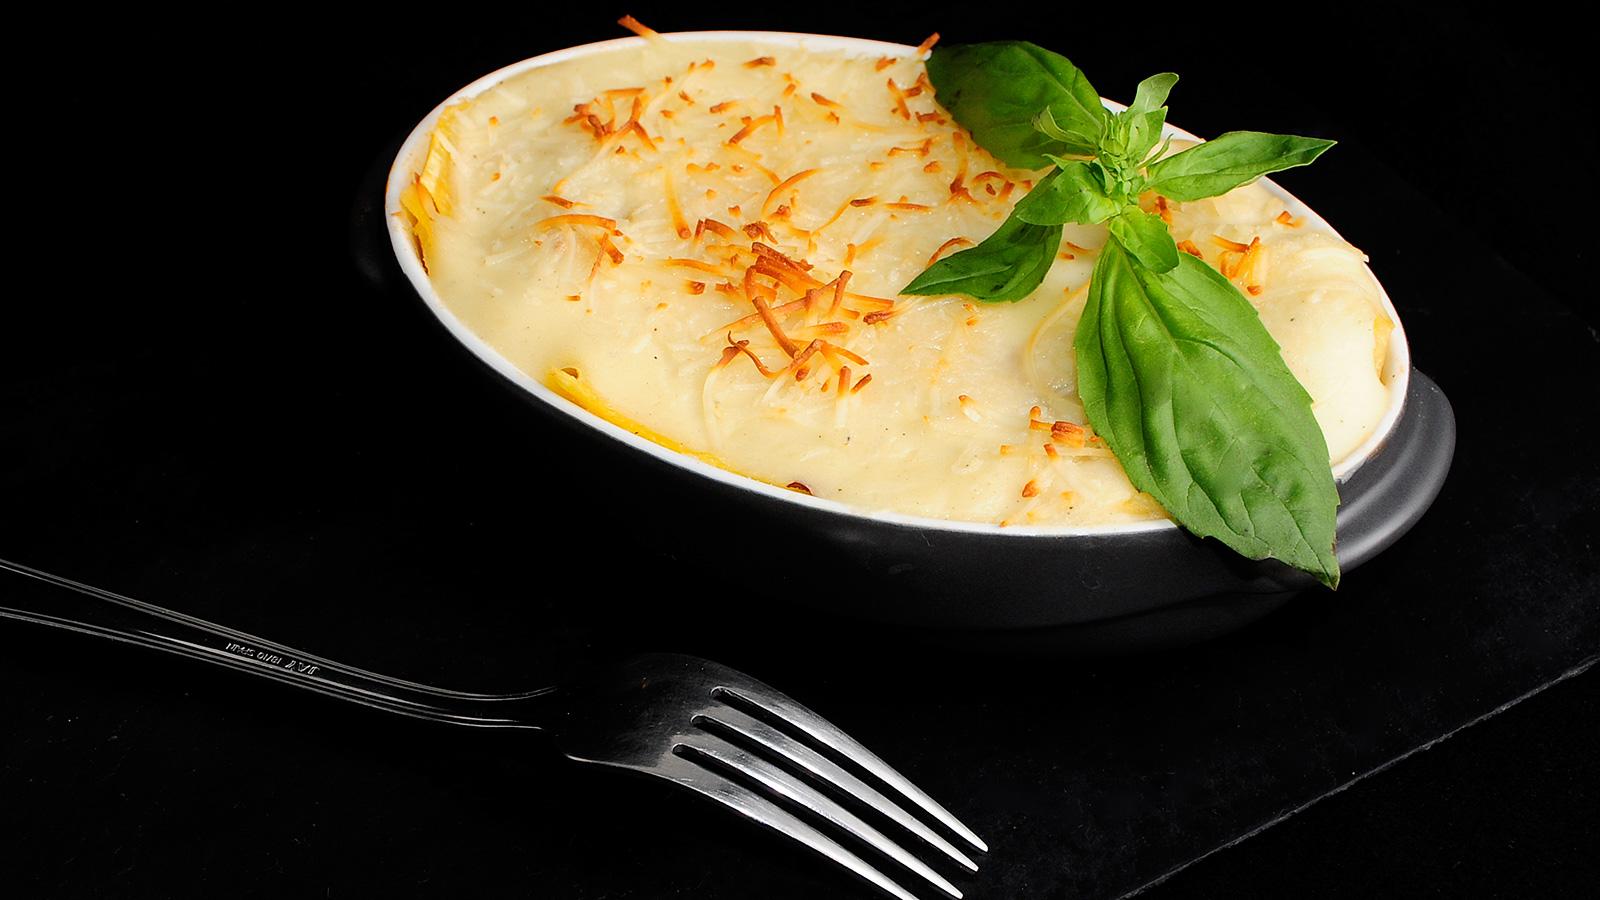 lasa a vegetal sergio fern ndez receta canal cocina